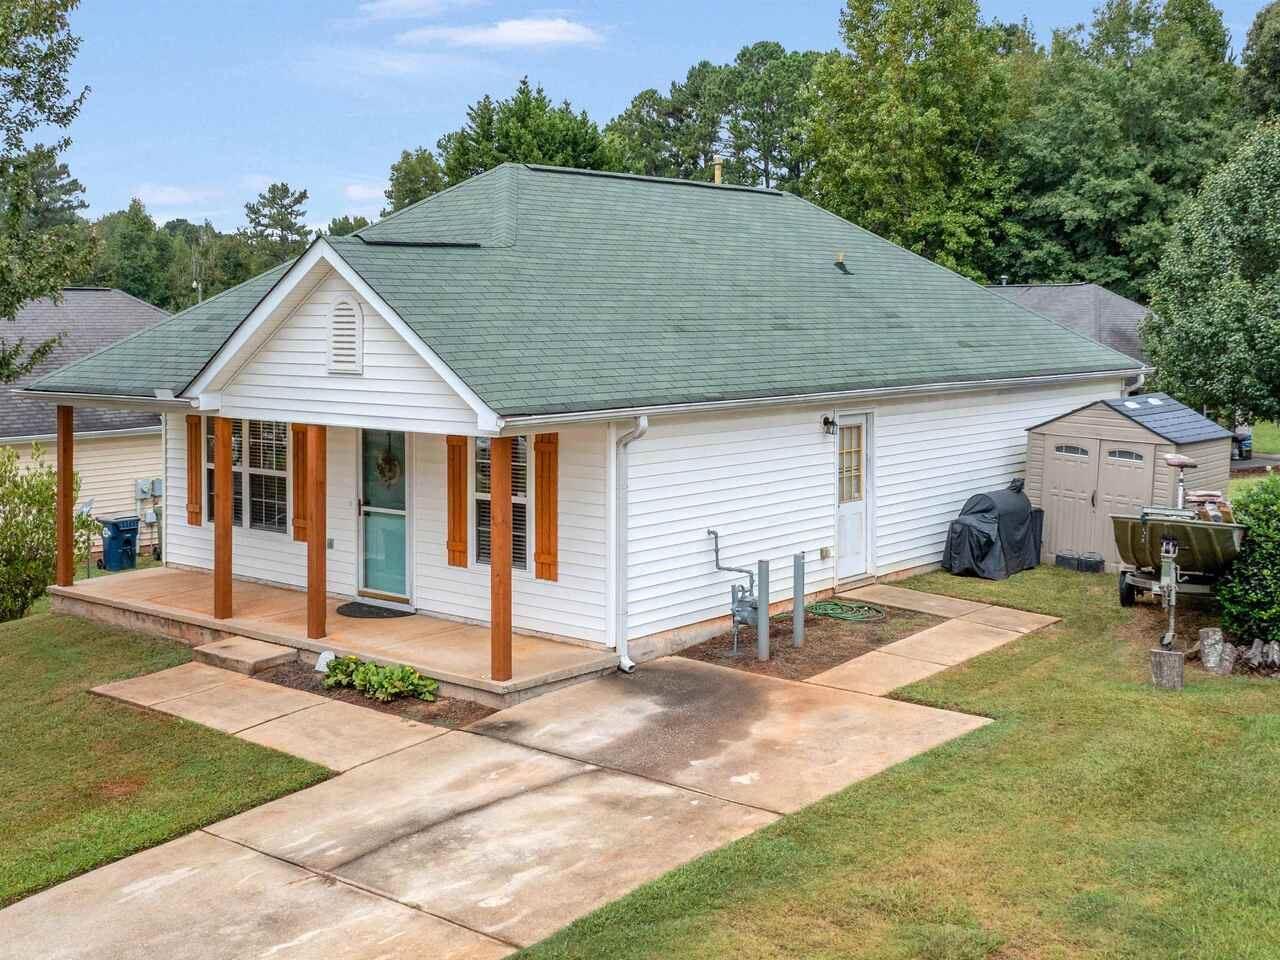 108 Poplar Pointe Terrace, Griffin, GA 30224 - #: 9055298